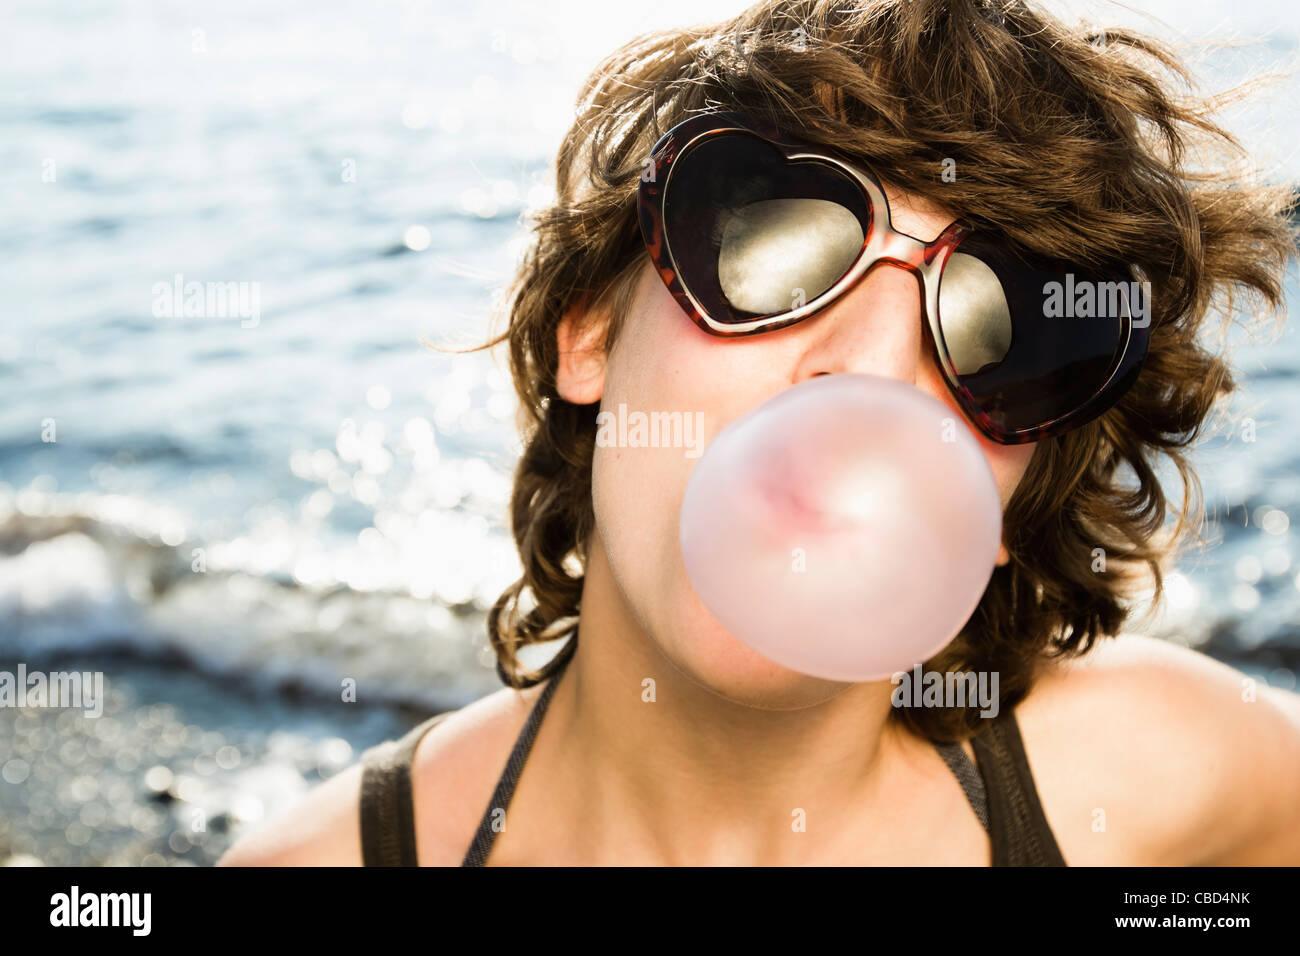 Frau bläst Blase am Strand Stockbild